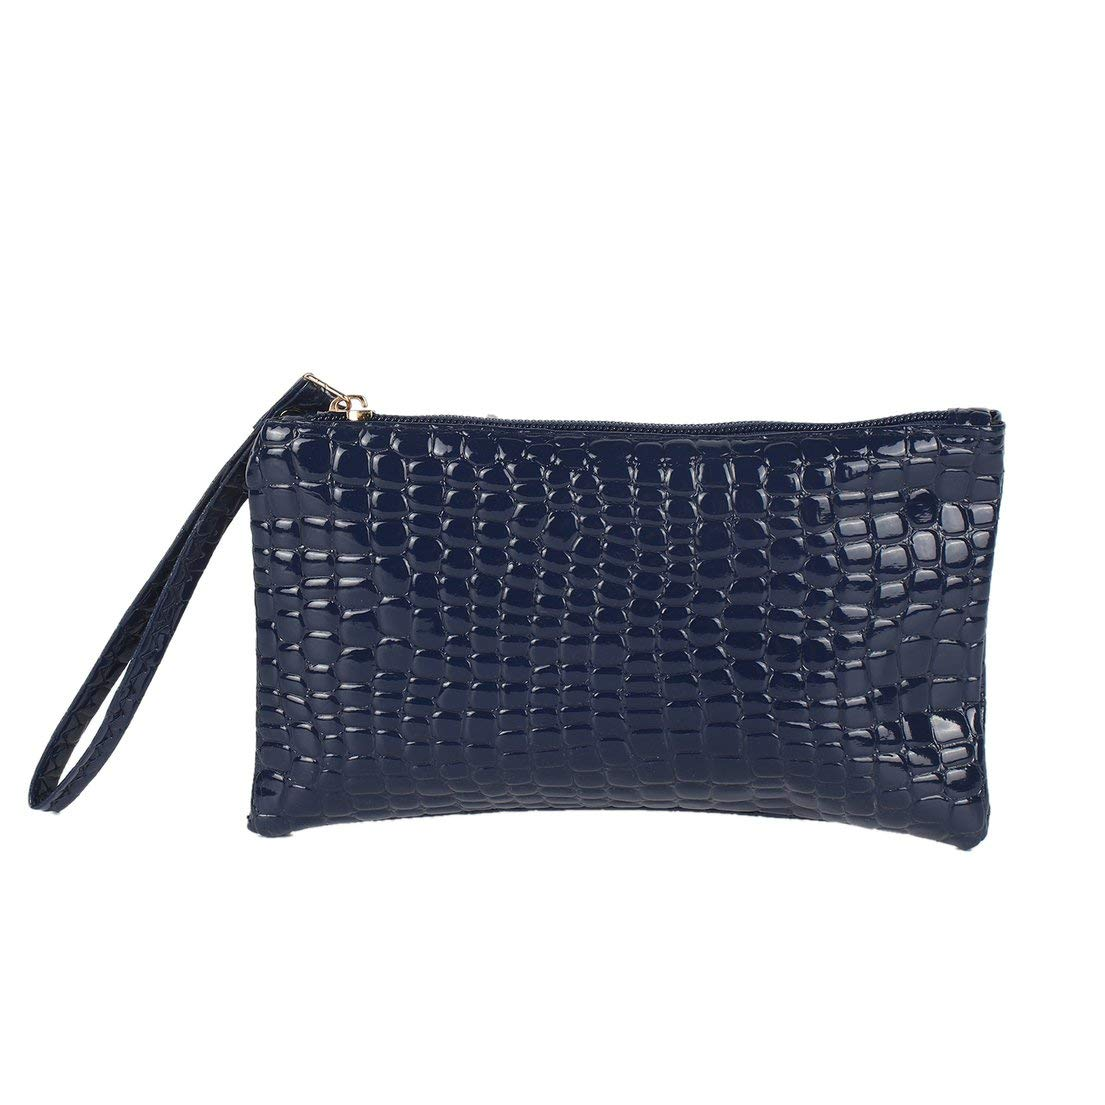 DFHJSXDFRGHXFGH-ES Casual Girl Long Purse Trendy Universal Women Wallet Card Holder Monedero Encantador para Mujer Fashion Women Parts Royal Blue DFHJS